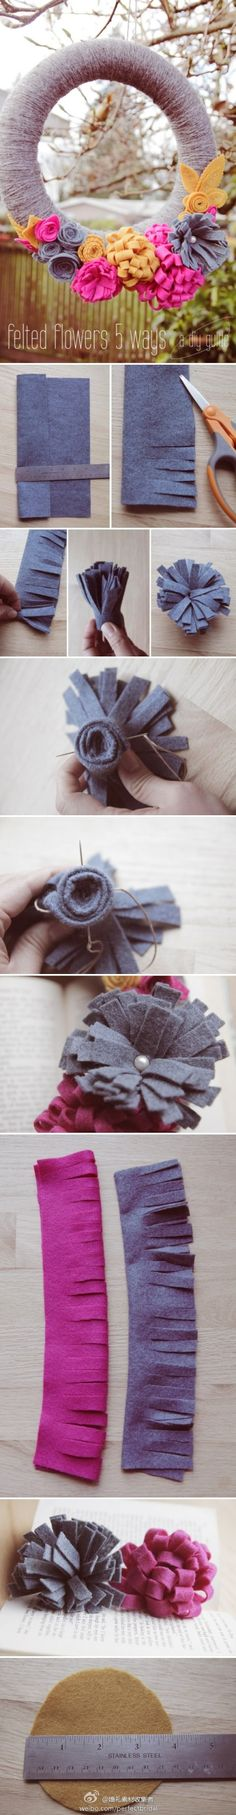 Cool Flower Crafts , Paper Crafts for Teens , paper, craft, flower,wrap, gift, decor,blumen,basteln,bastelvorlage,tutorial diy, spring kids crafts, paper flowers, flower wreath